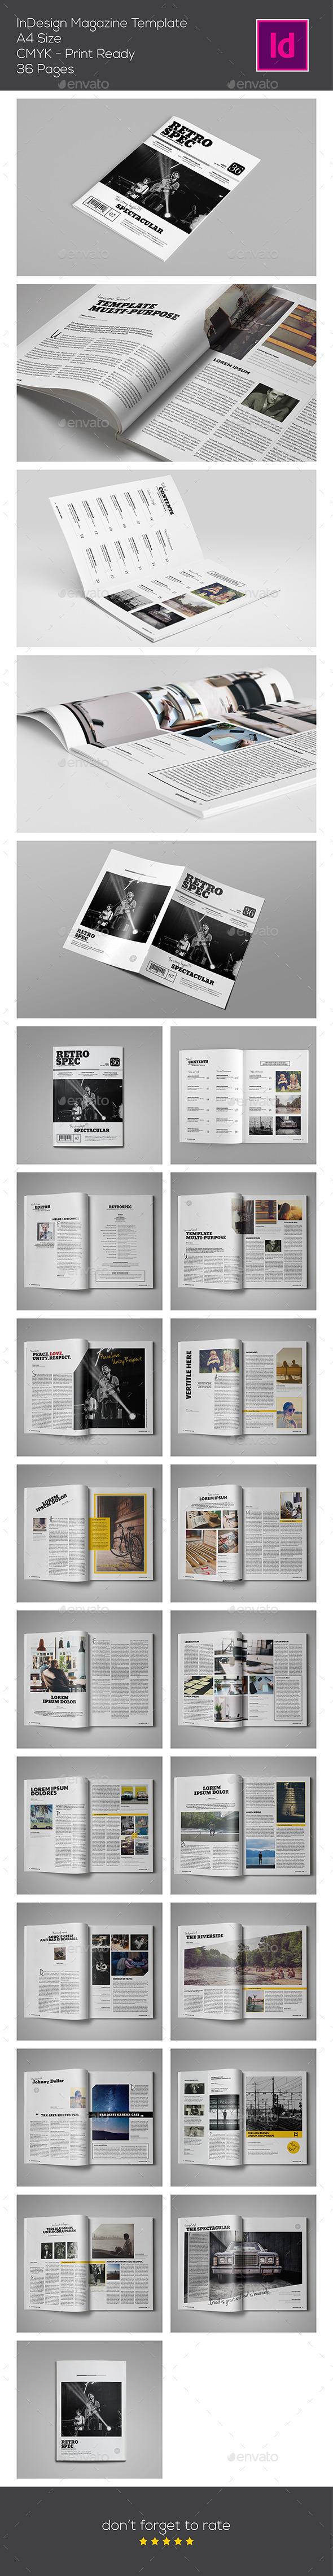 GraphicRiver InDesign Magazine Template 9694359